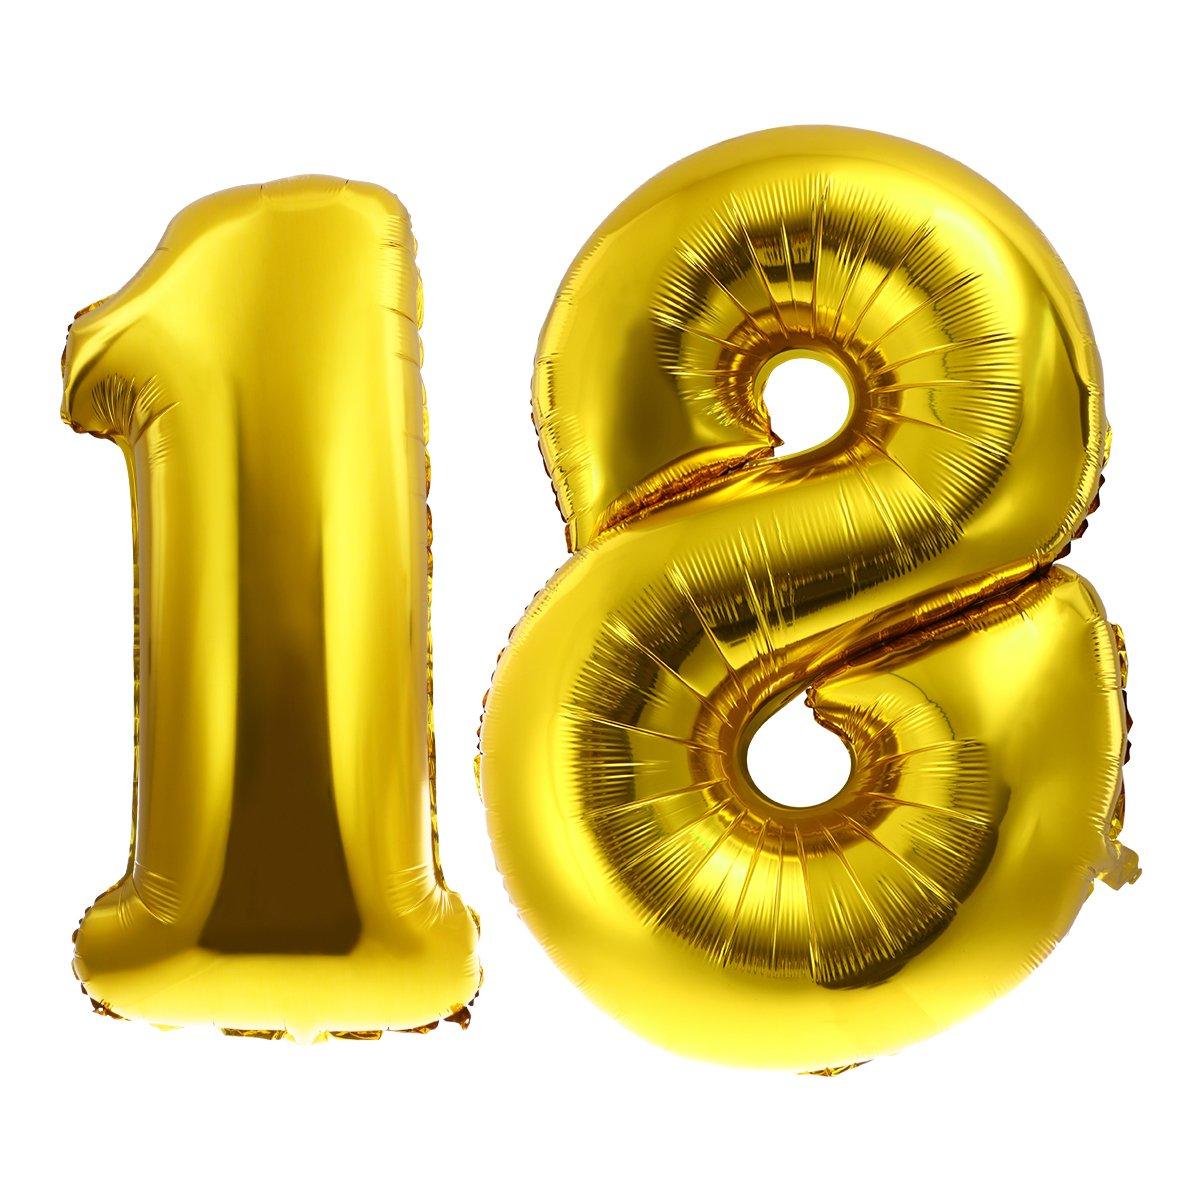 toymytoyジャンボ数18バルーン40インチゴールド18日ホイルバルーン誕生日パーティーFavors、記念日卒業式Supplies   B07CVHCR4Q